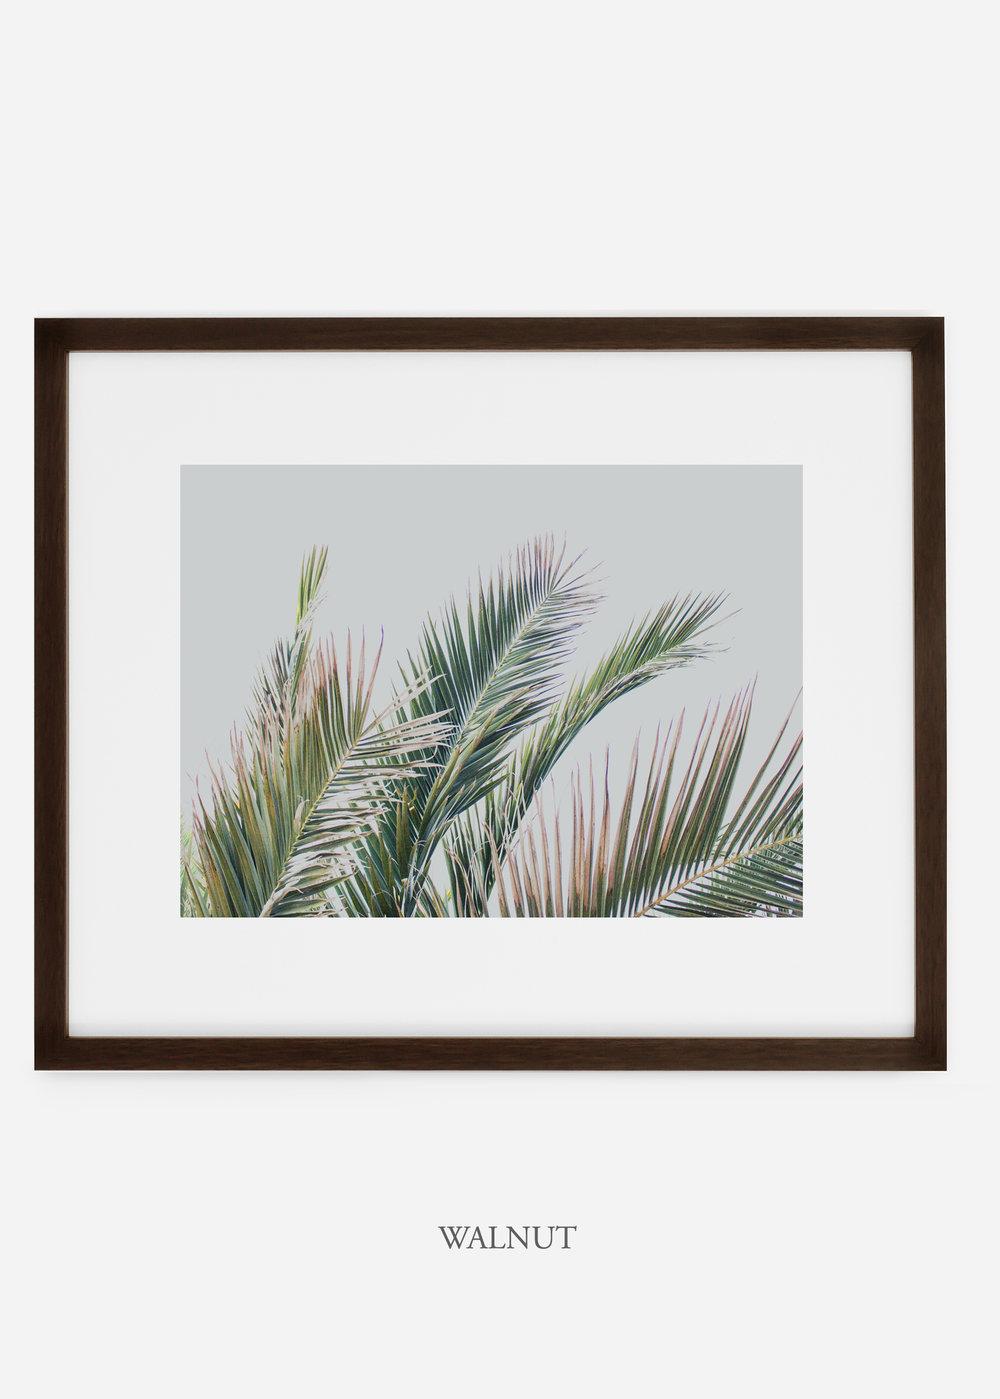 interiordesign_walnutframe_art_tropical_palmtree_StormyGrayPalm.jpg